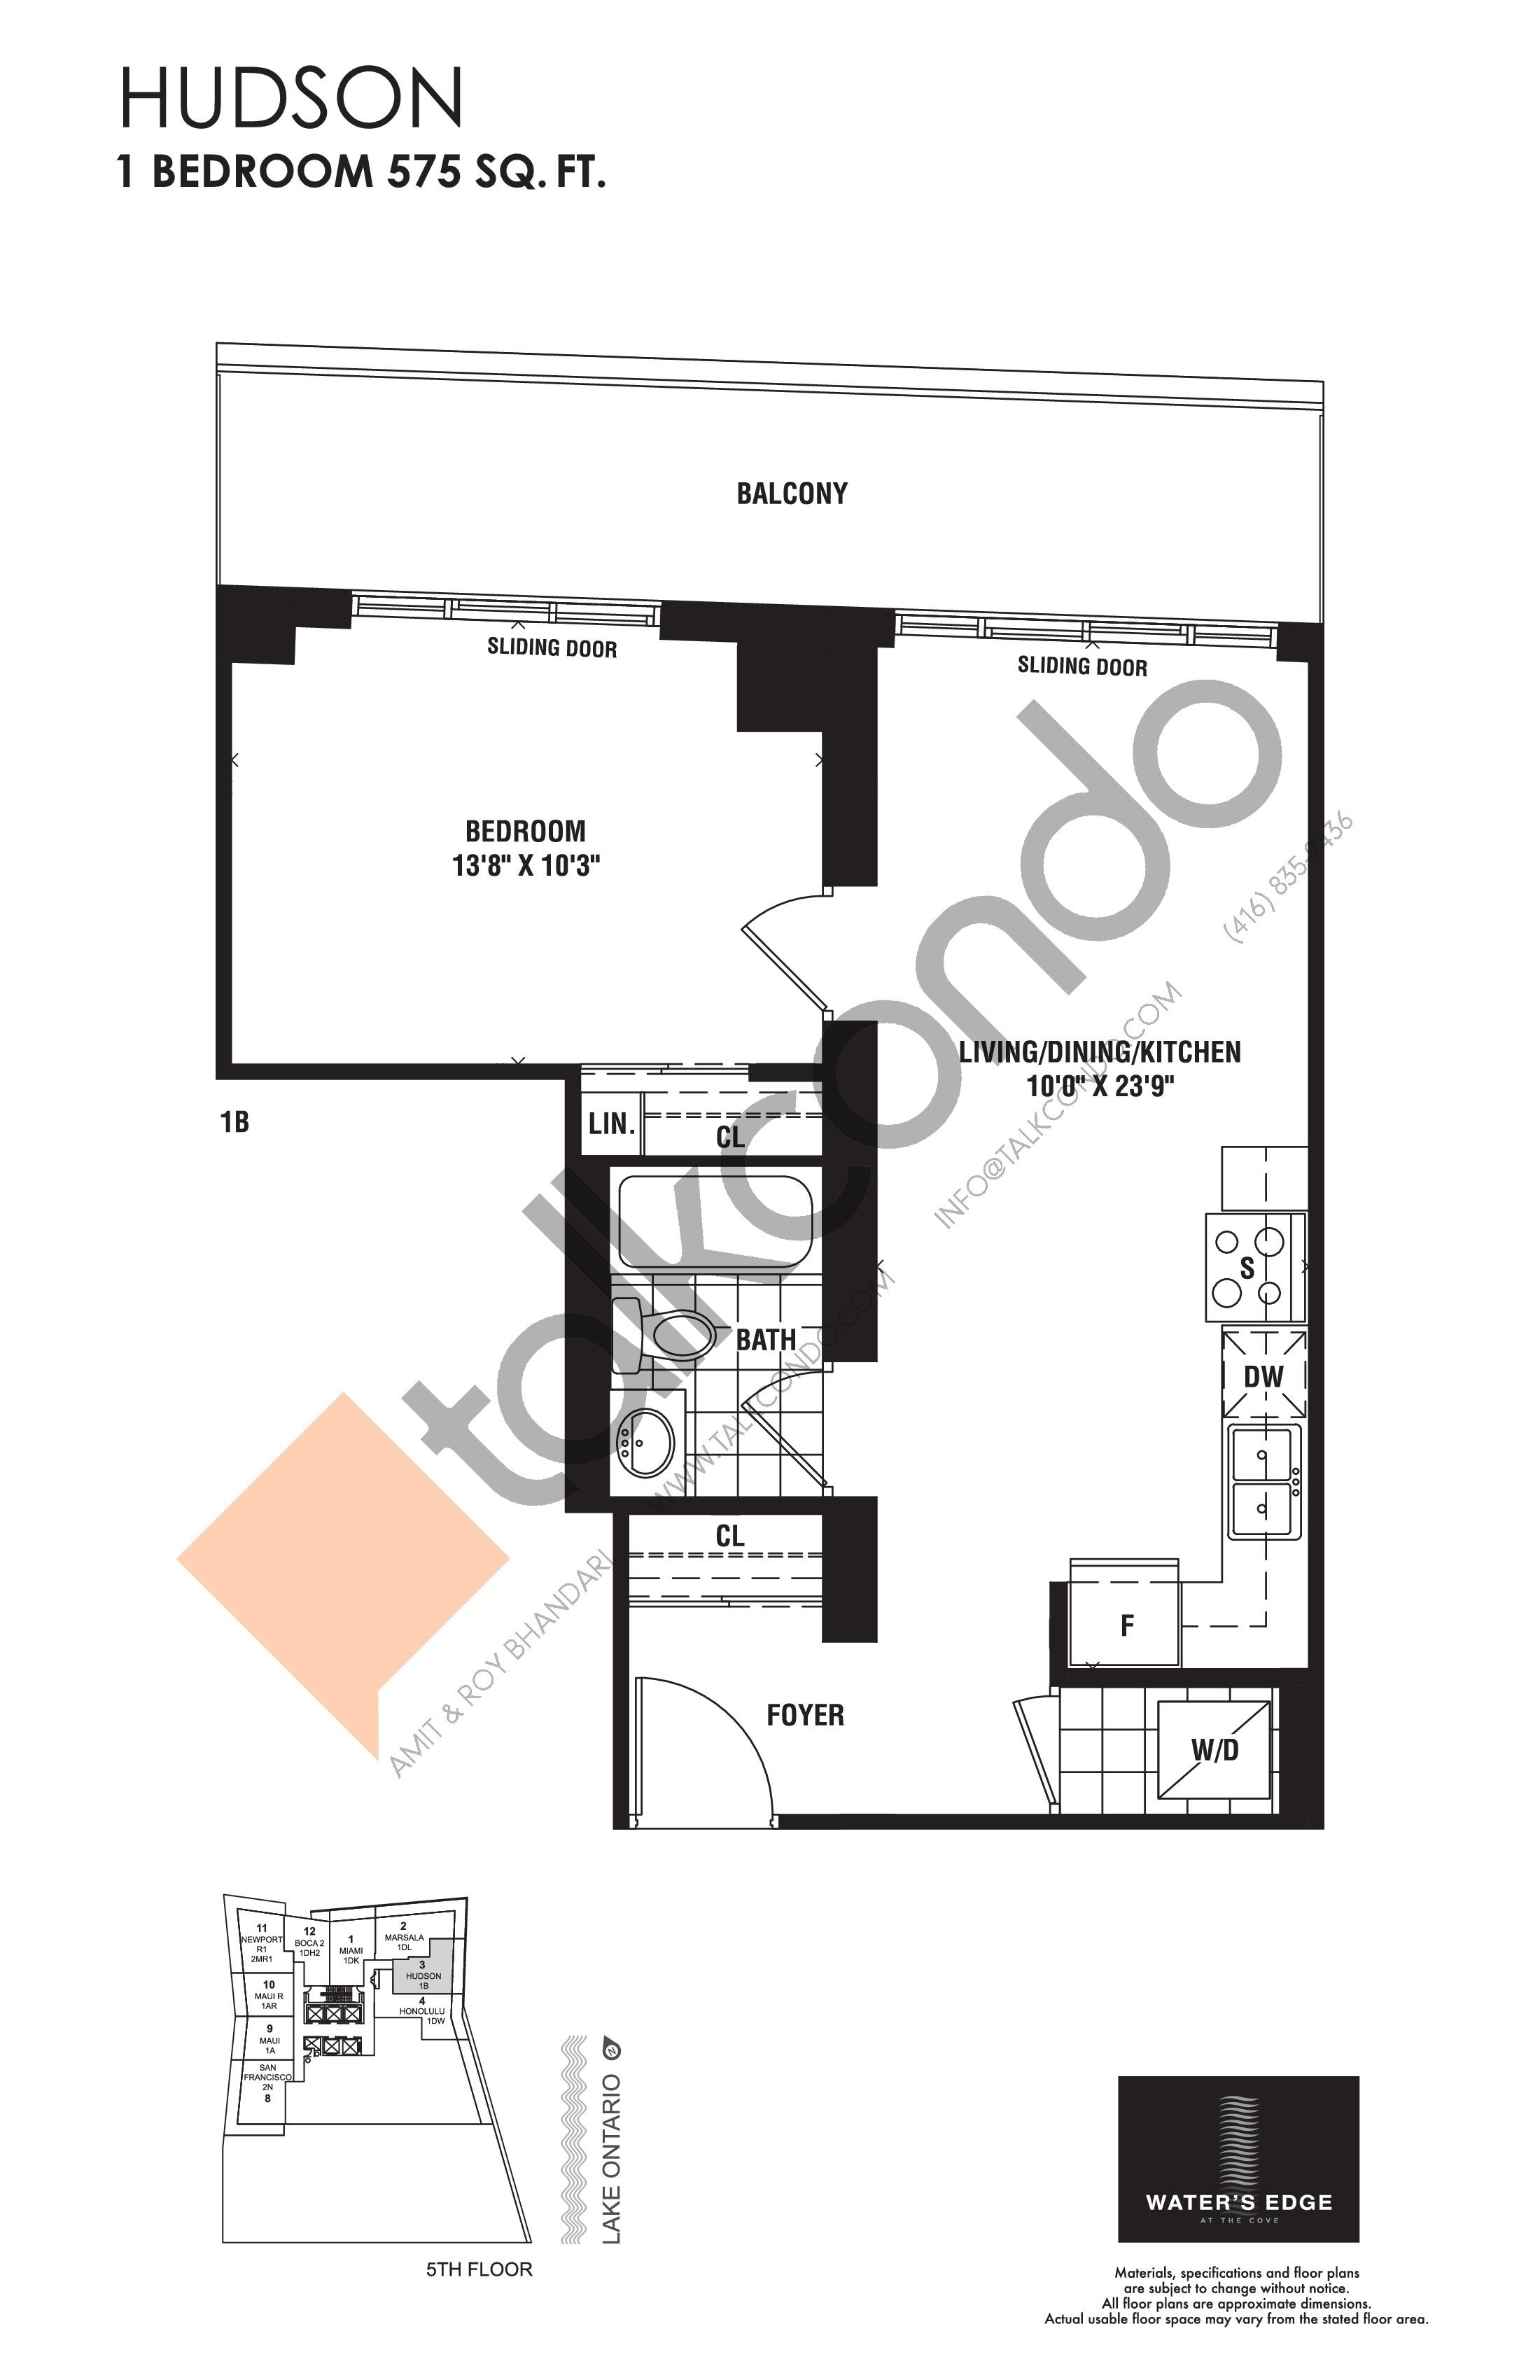 Hudson Floor Plan at Water's Edge at the Cove Condos - 575 sq.ft